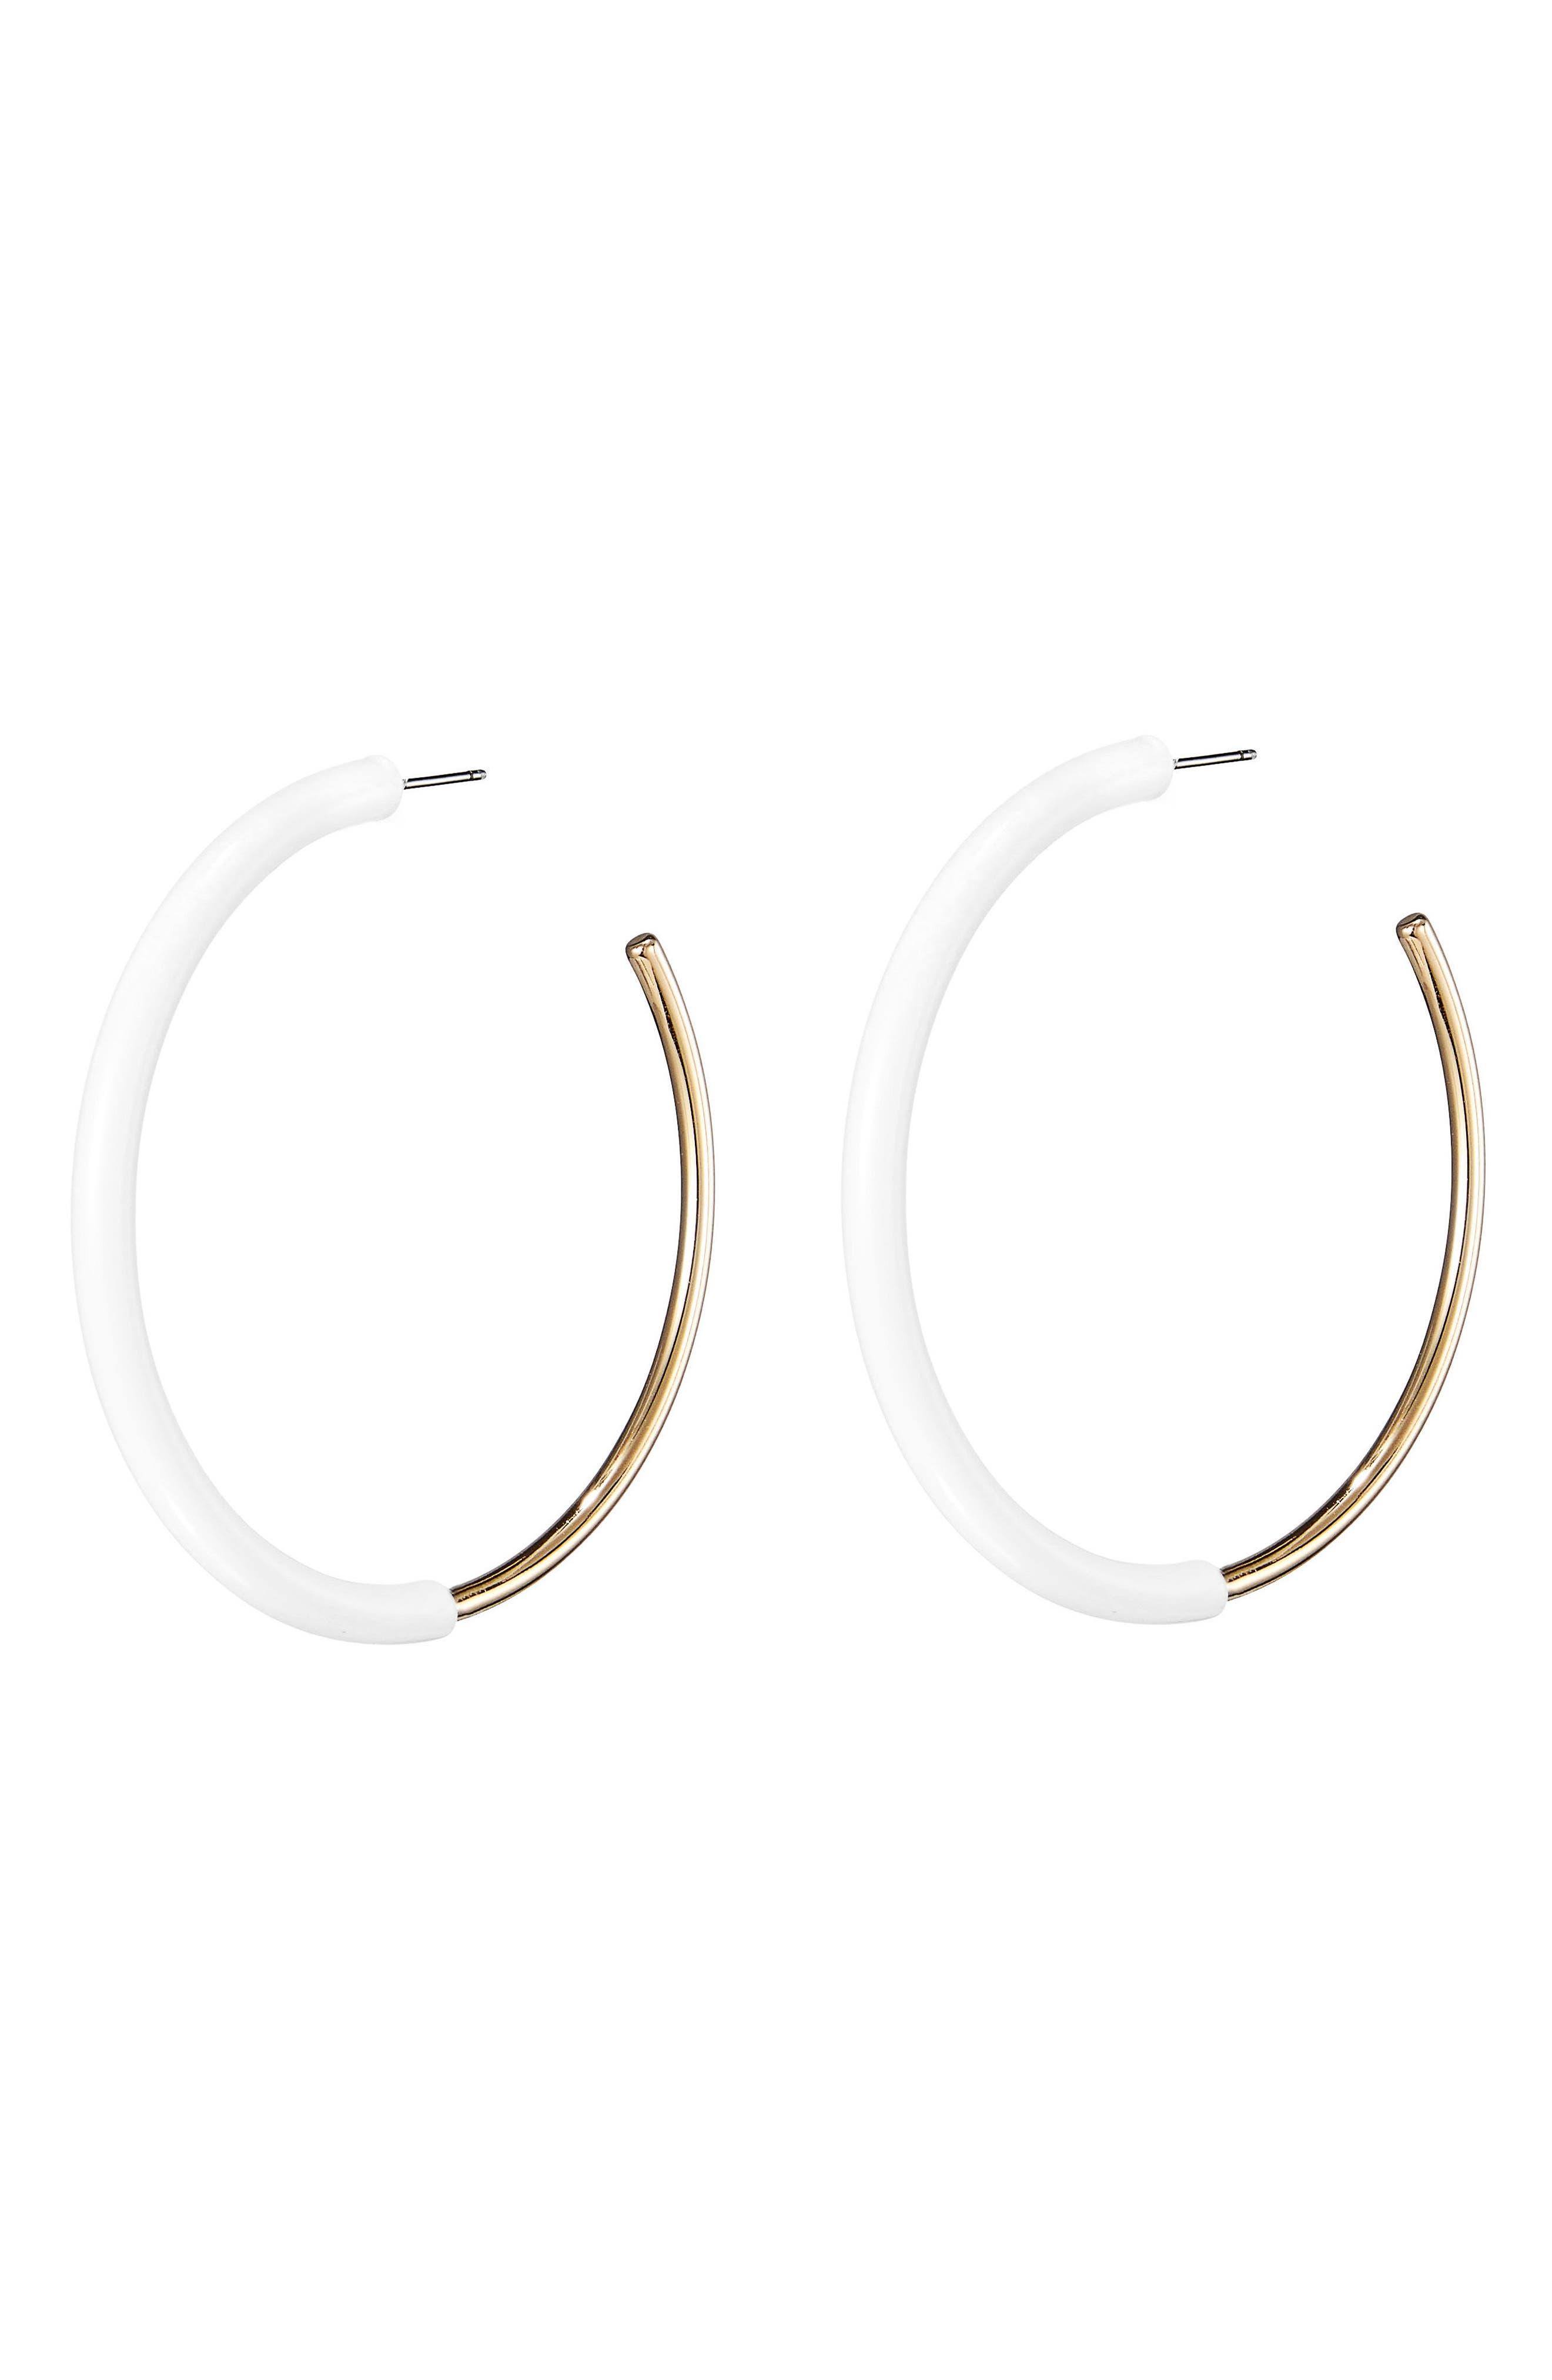 Lola Small Hoop Earrings,                             Alternate thumbnail 3, color,                             Gold/ White